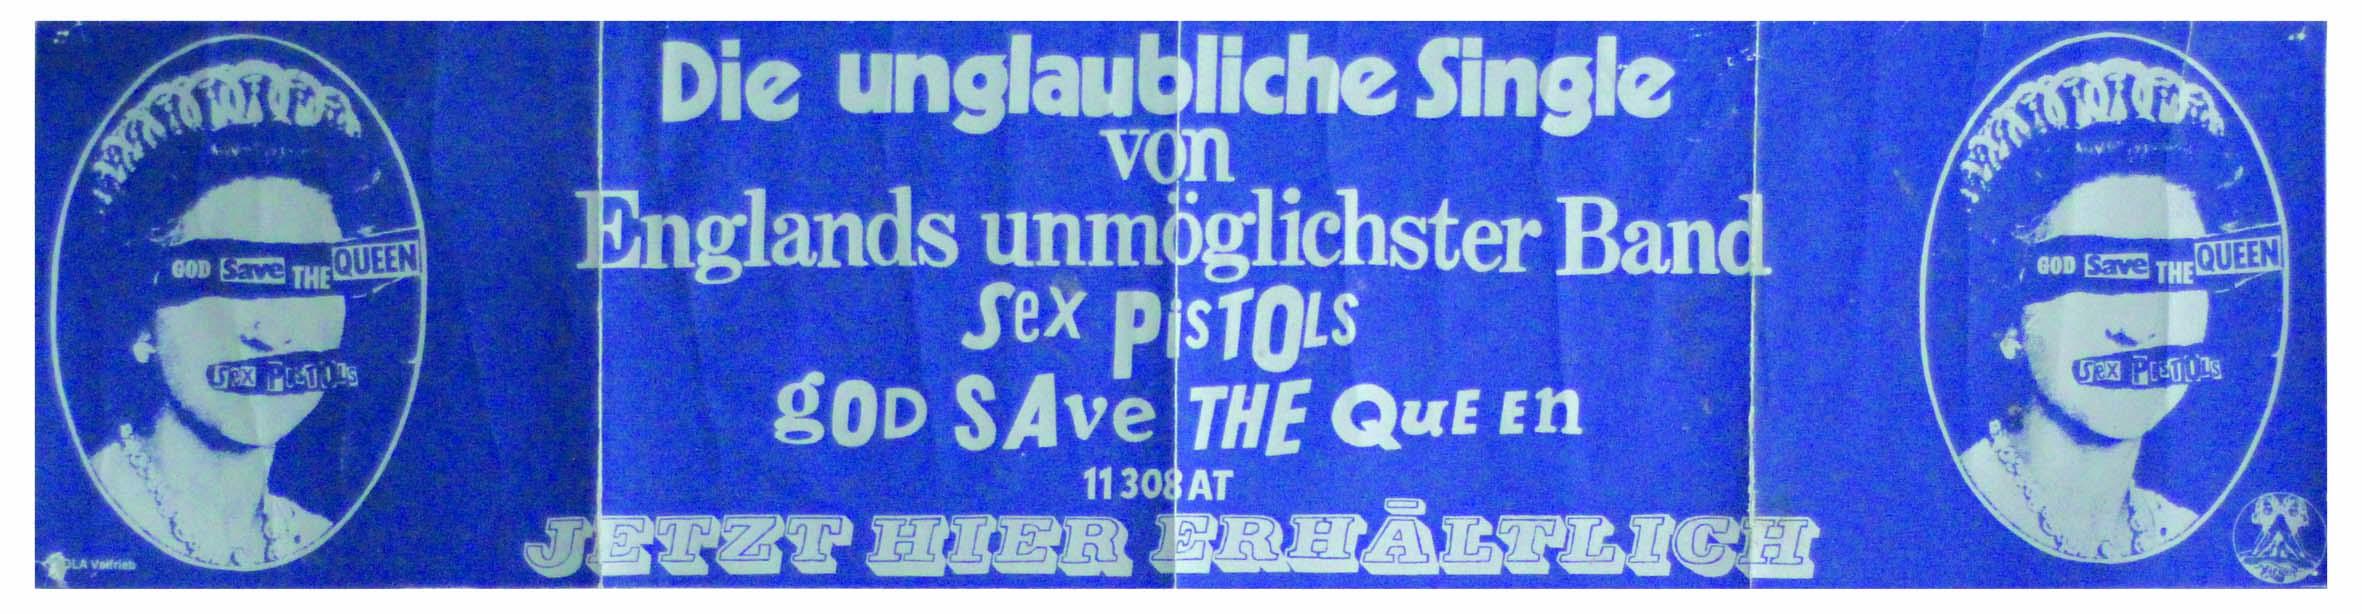 GSTQ - German Poster 1977